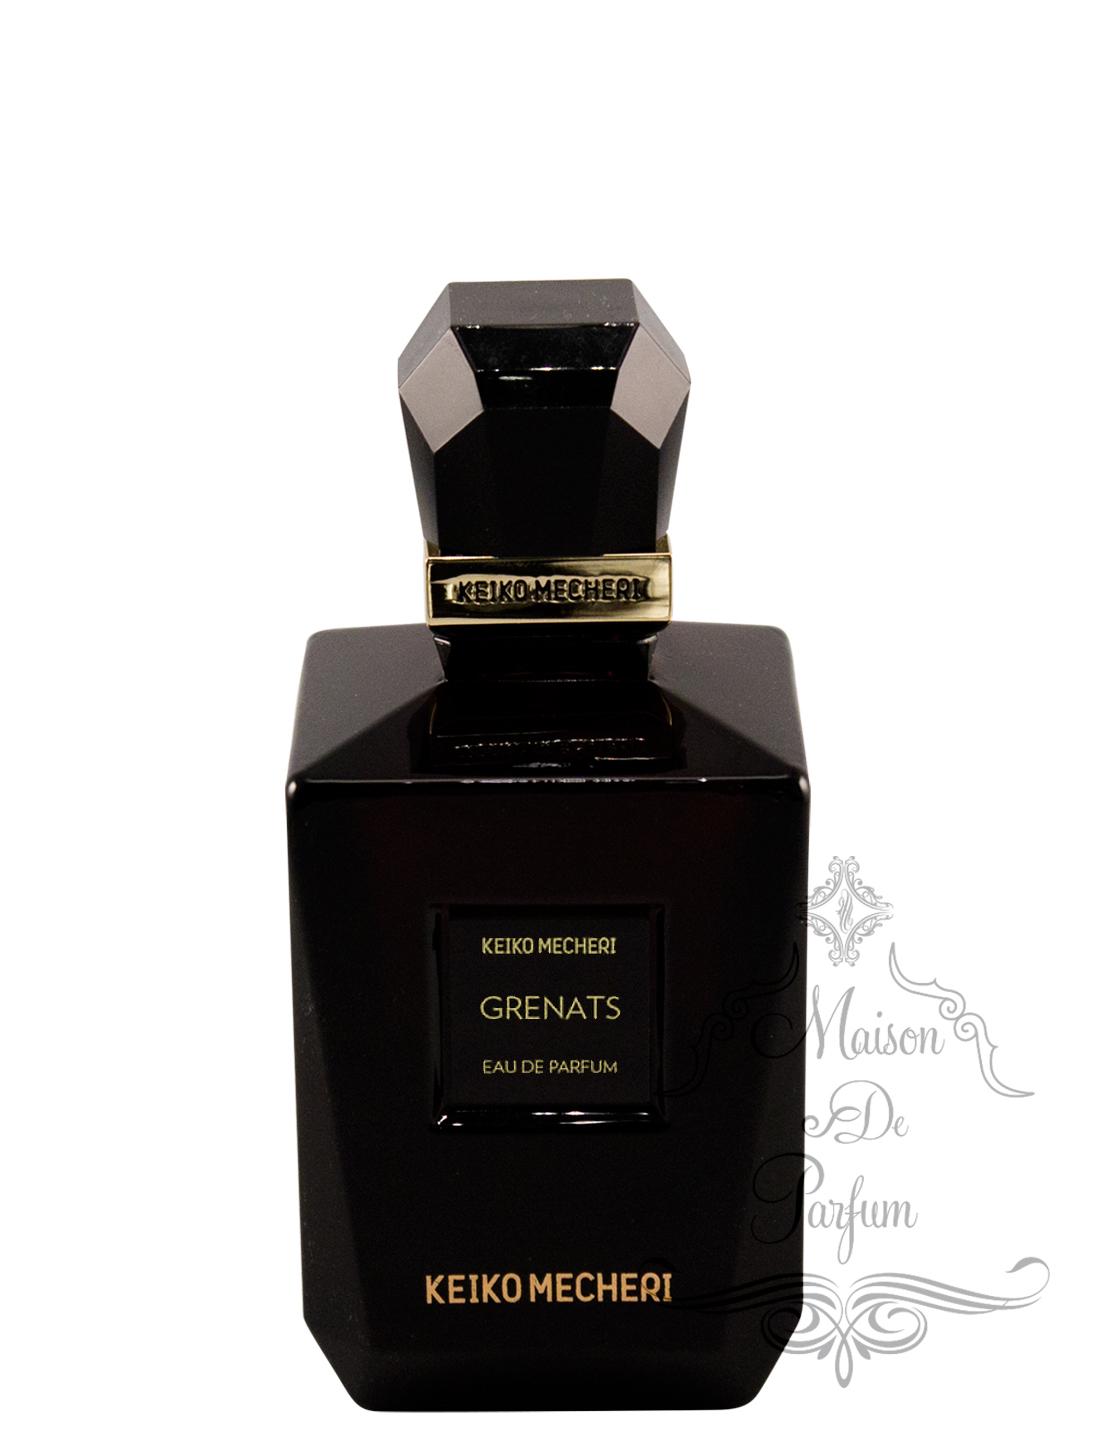 Grenats